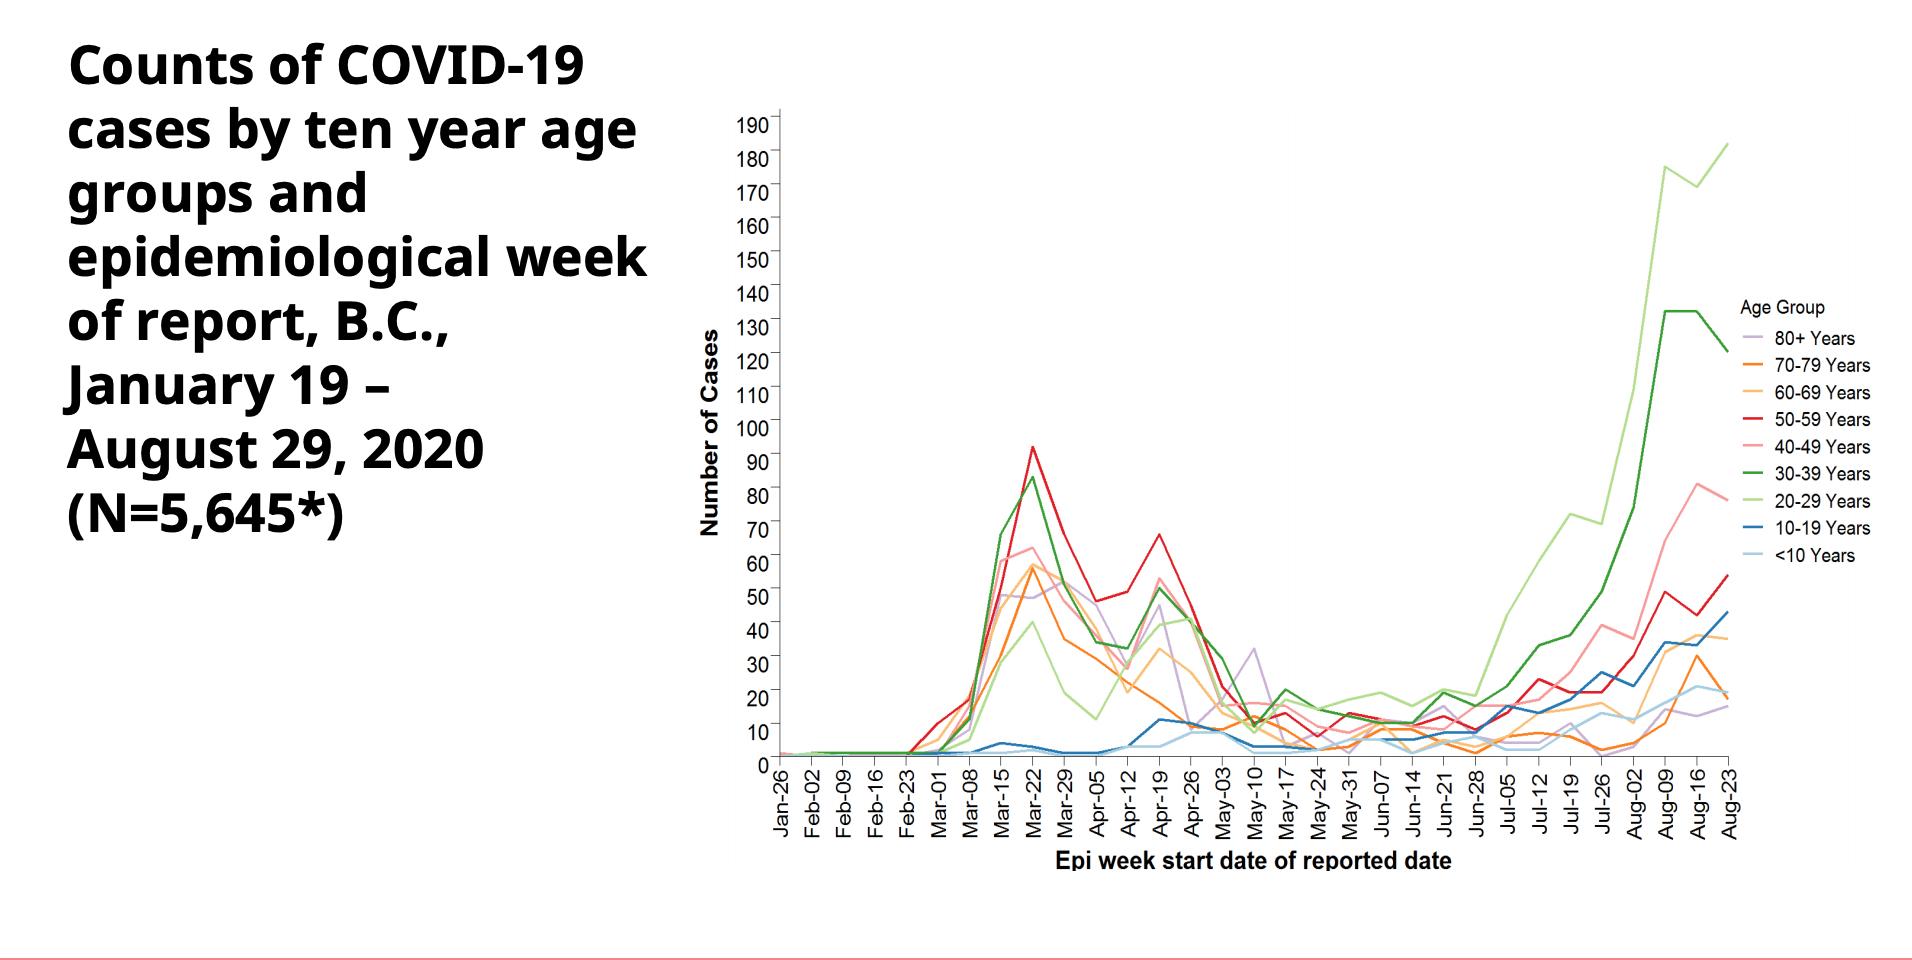 B.C. announces 121 new COVID-19 cases, 1 more death